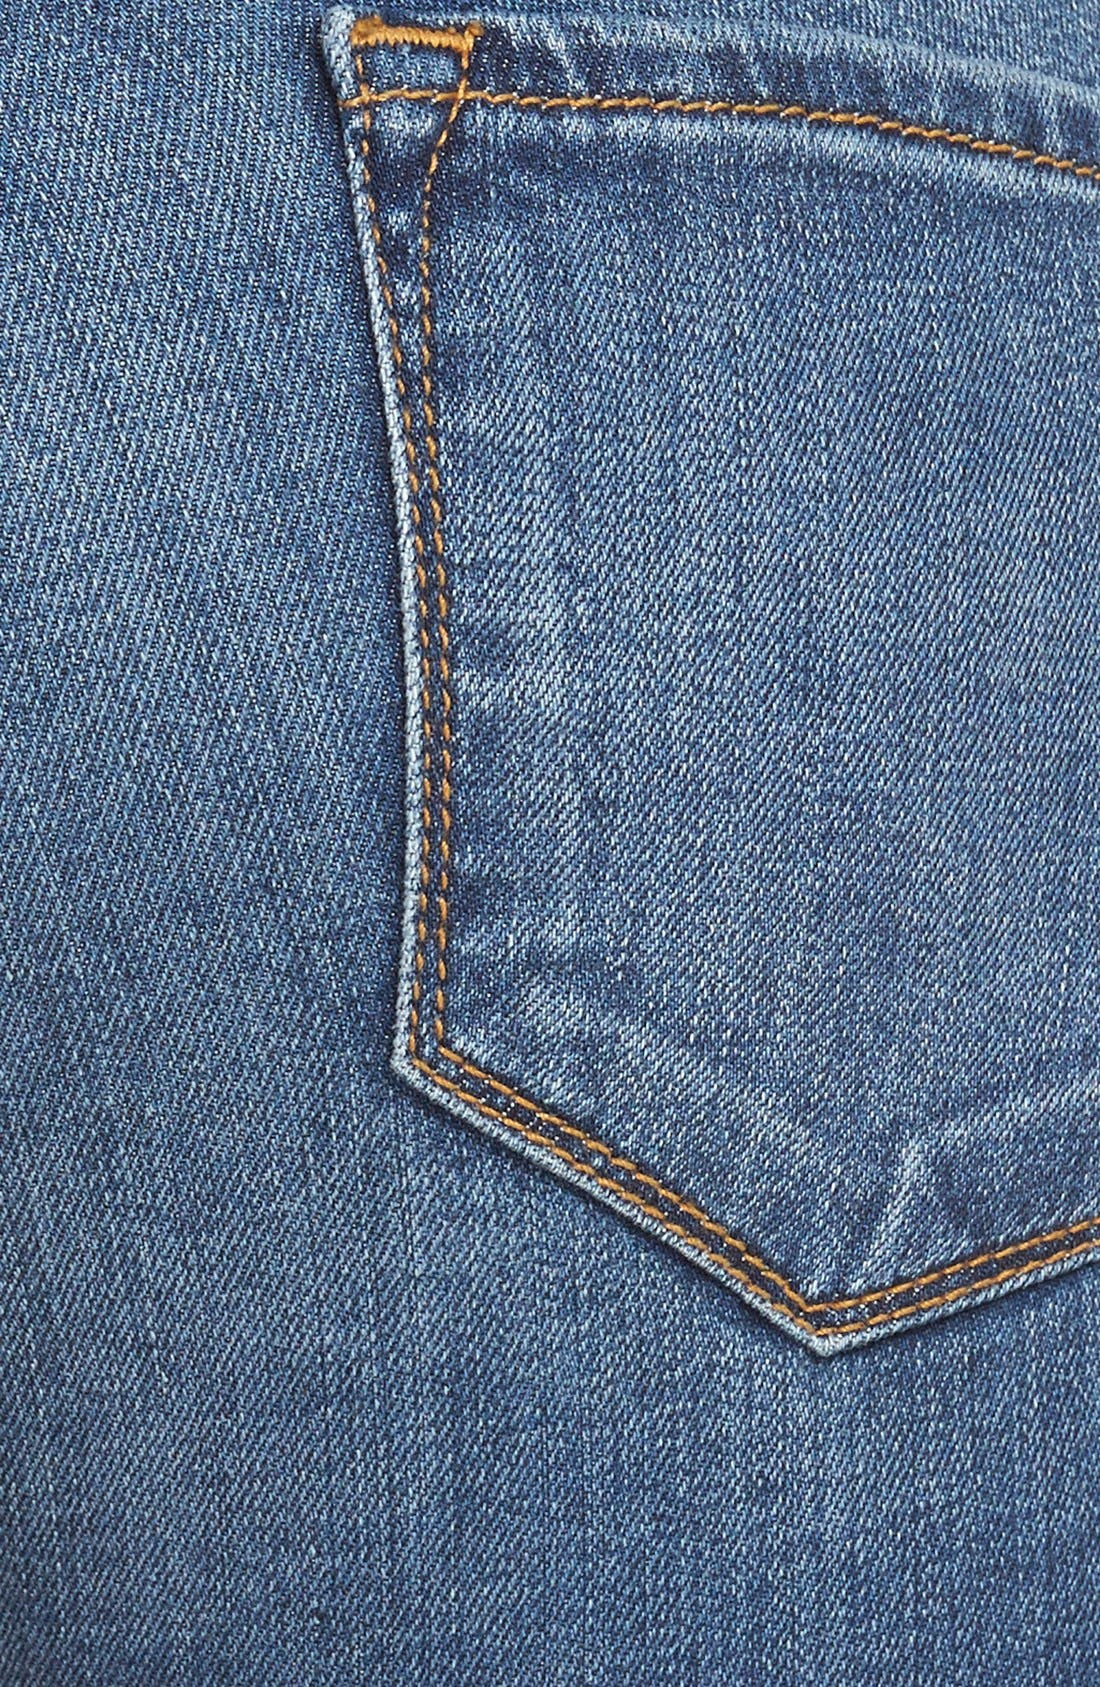 Alternate Image 3  - STS Blue Skinny Jeans (Medium)